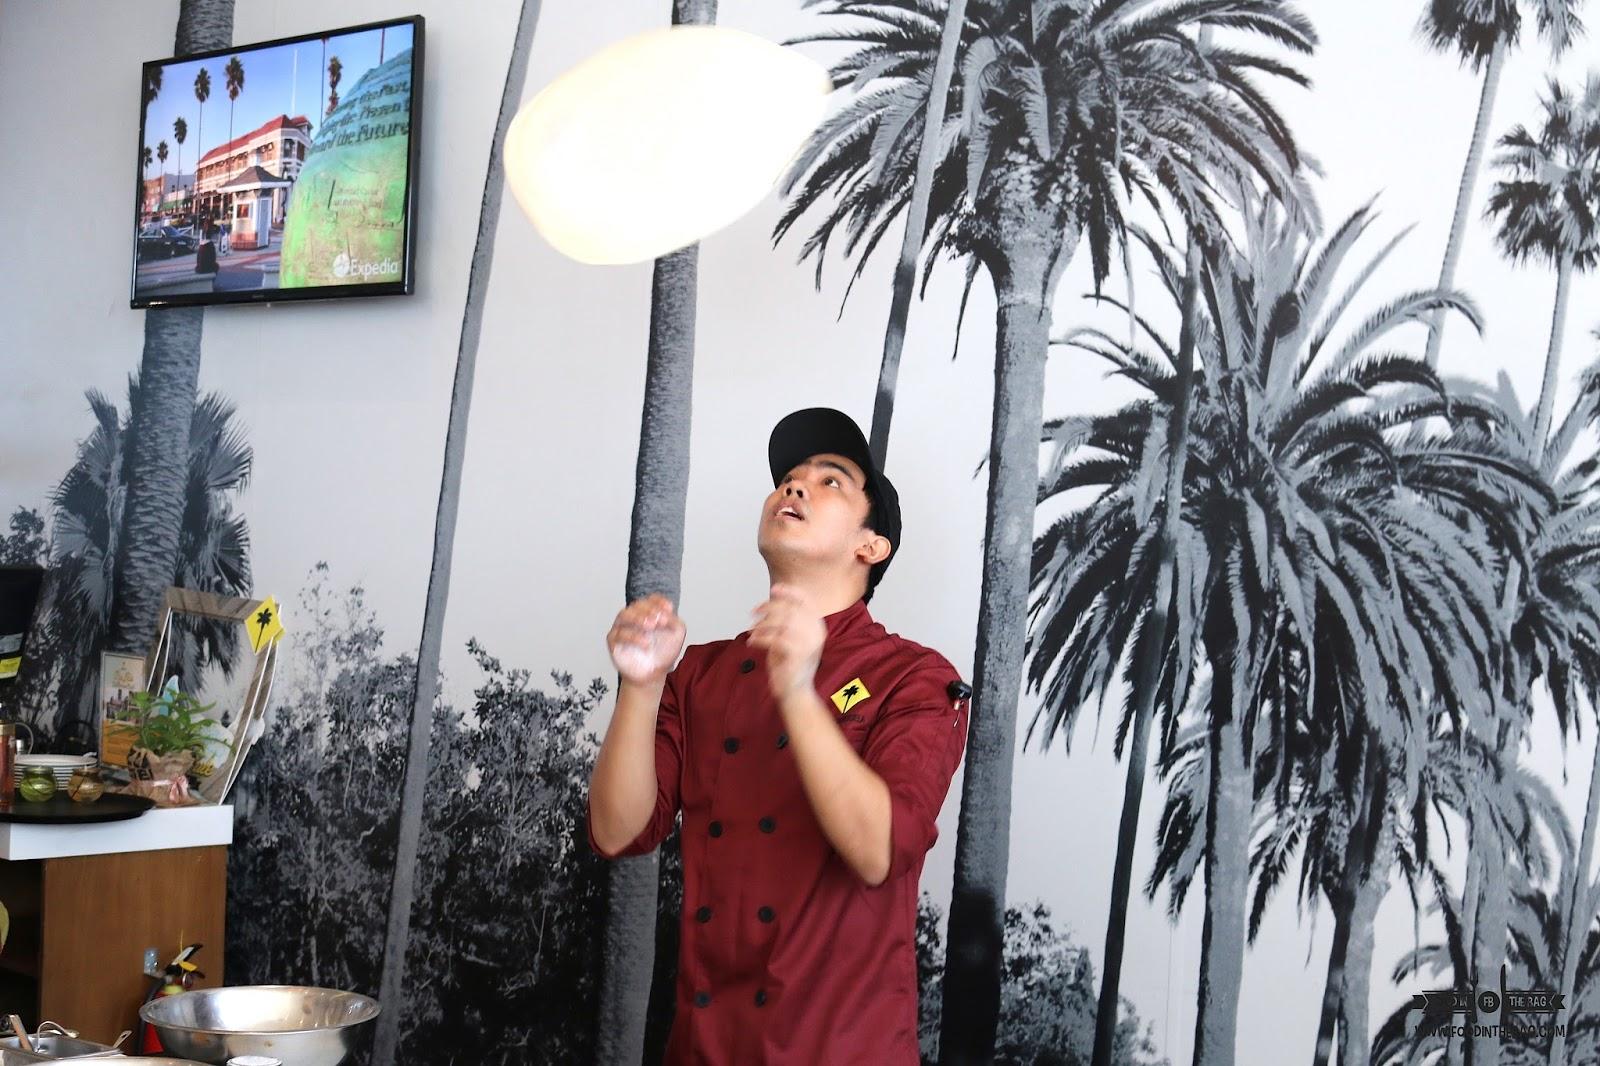 California Pizza Kitchen Palm Tree California Pizza Kitchen Pizza Wars 2016  Food In The Bag